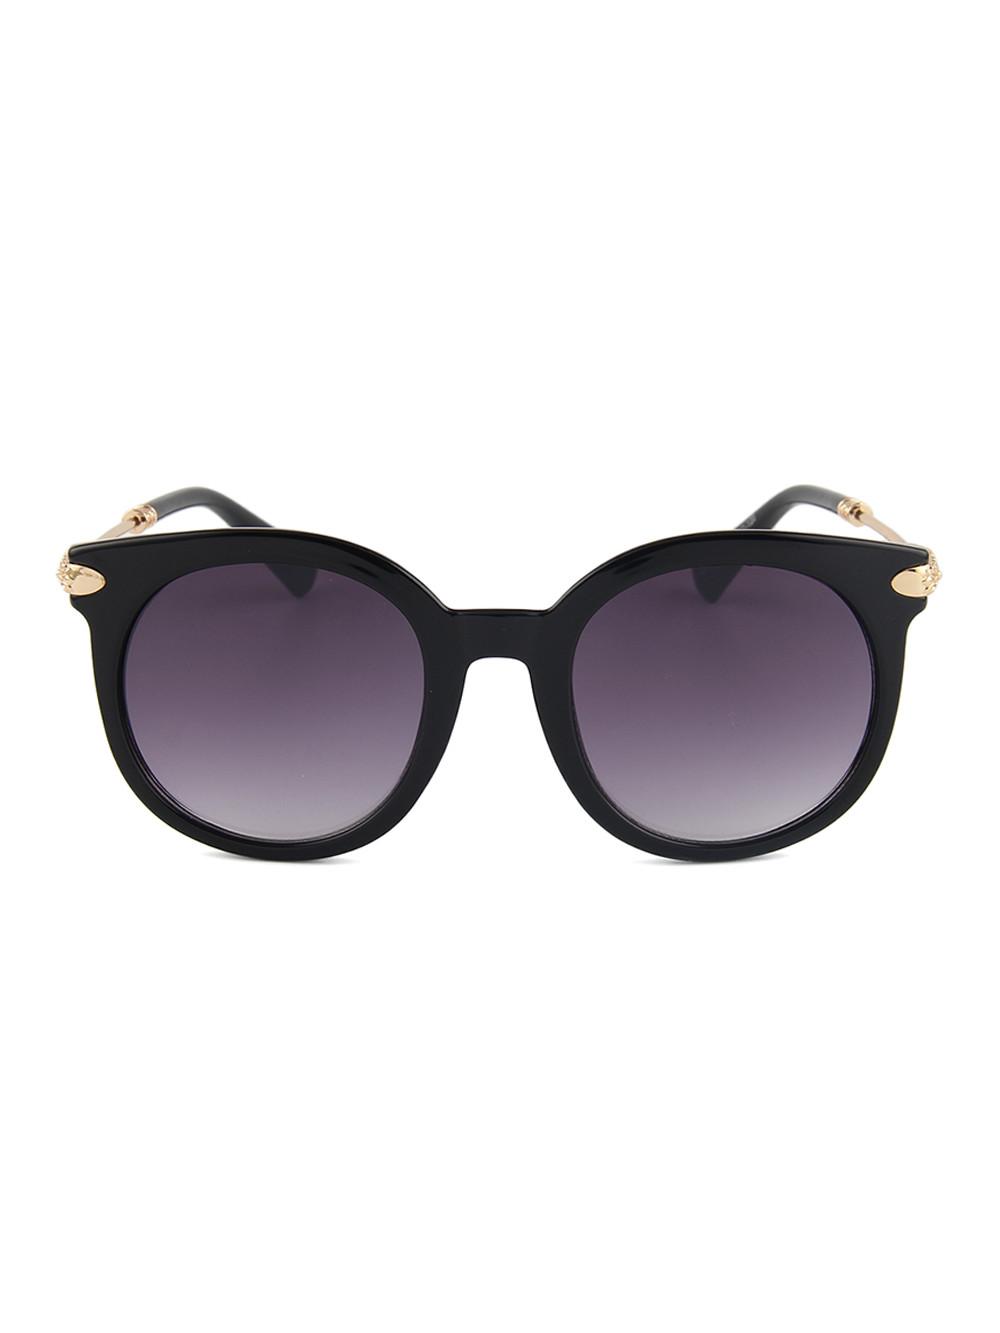 Dámske slnečné okuliare Amélia Black 523c7281201